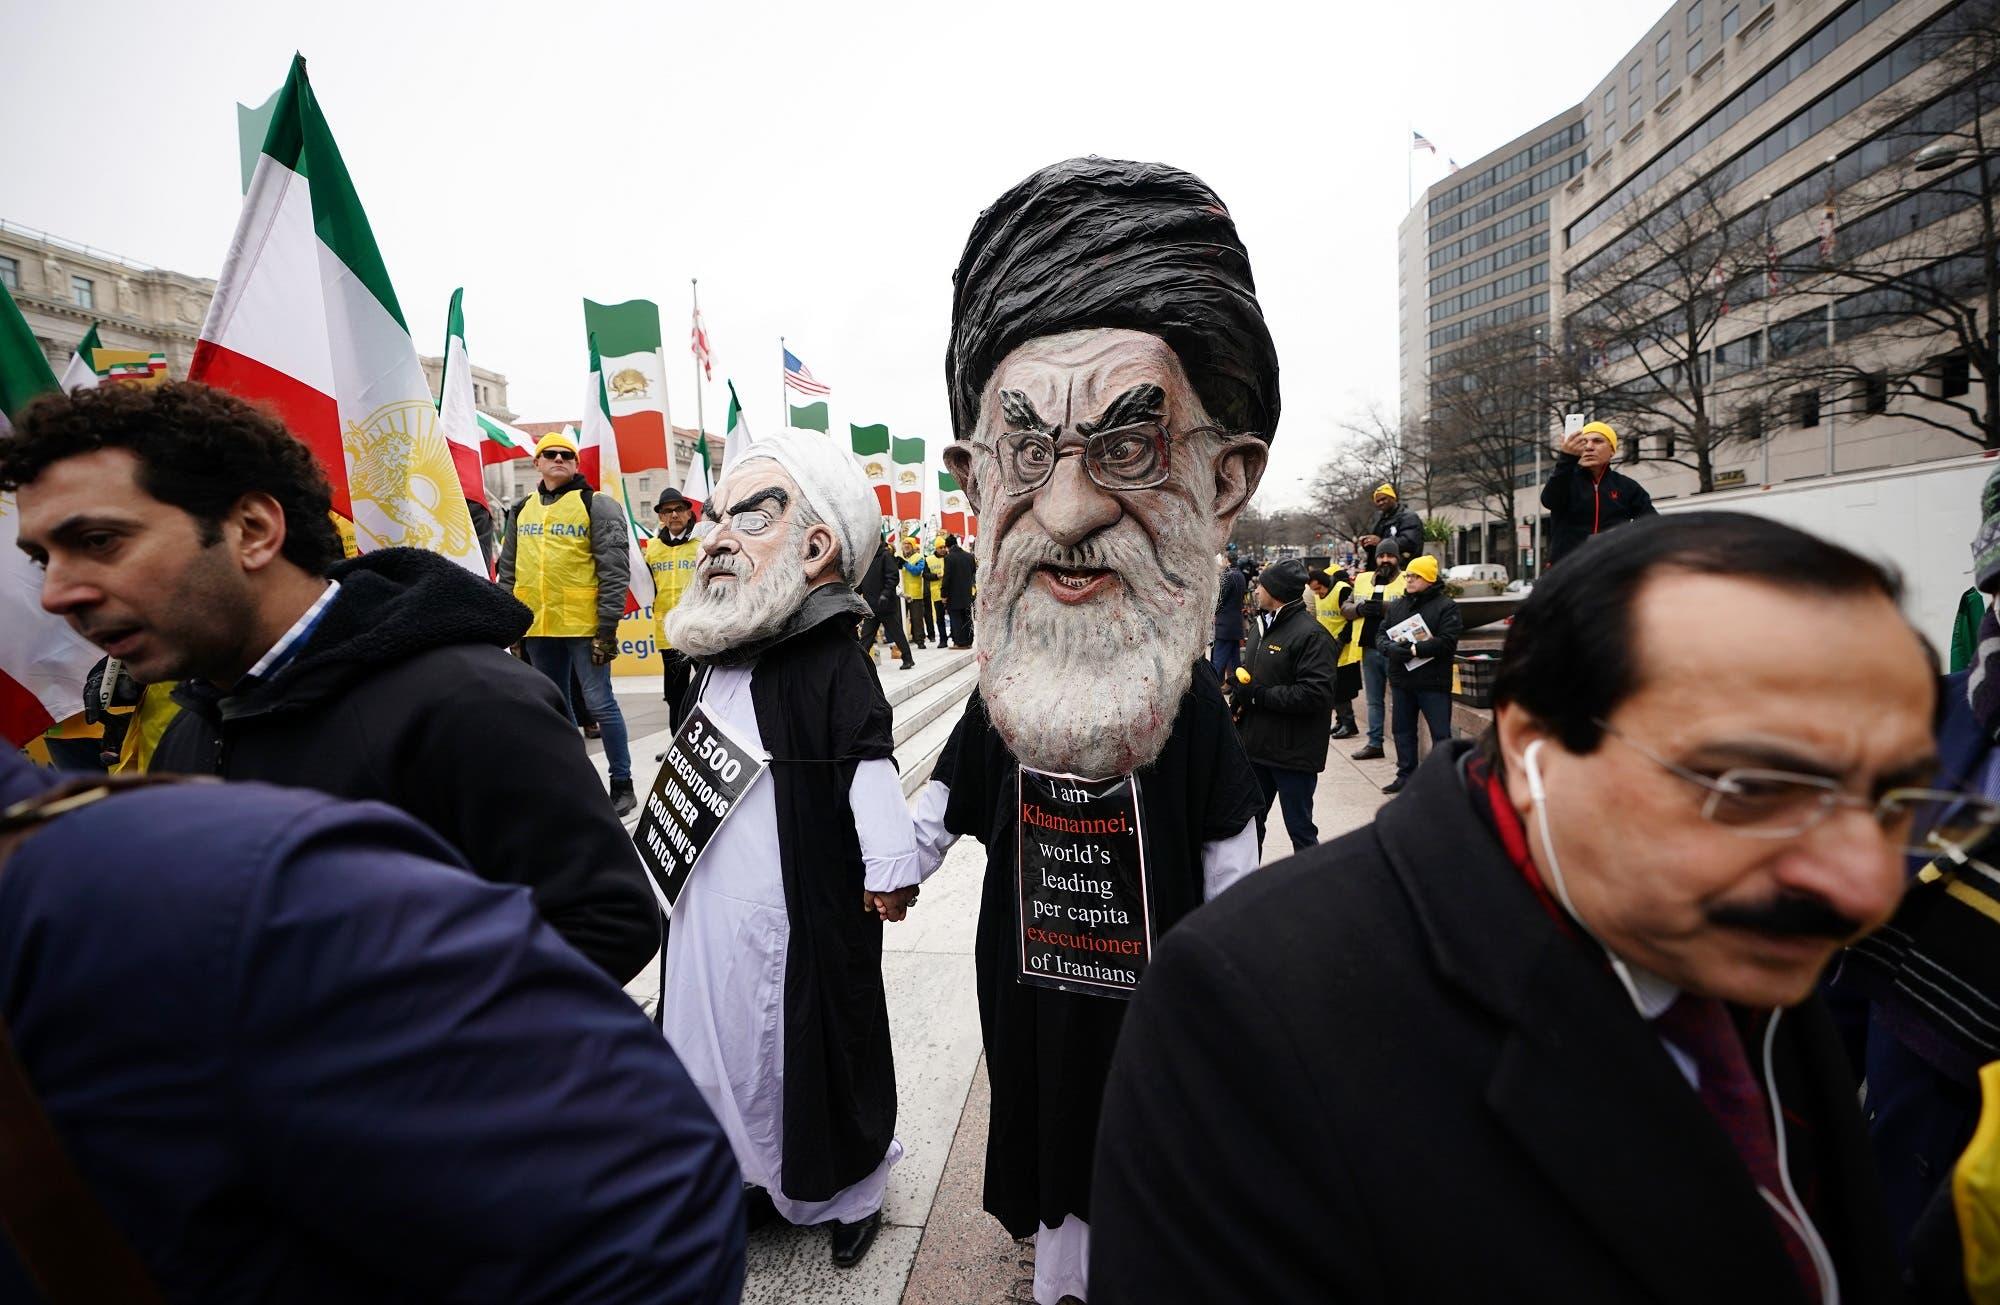 Effigies of Iranian President Hassan Rouhani and Iran's supreme leader Ayatollah Ali Khamenei march with the Organization of Iranian-American Communities on March 8, 2019 in Washington, DC. (AFP)